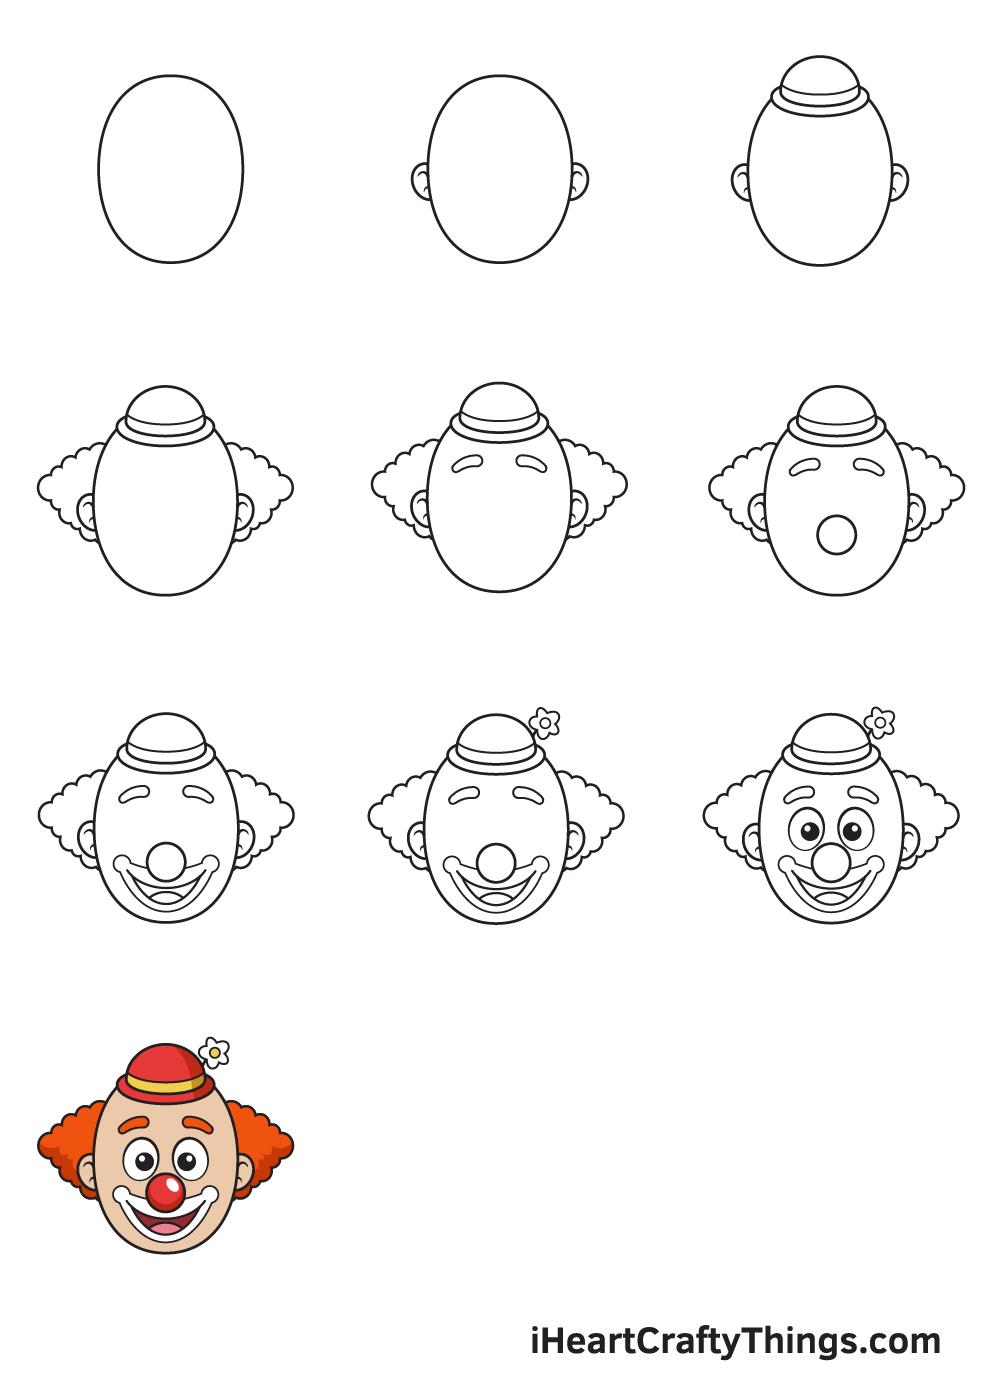 drawing clown in 9 easy steps